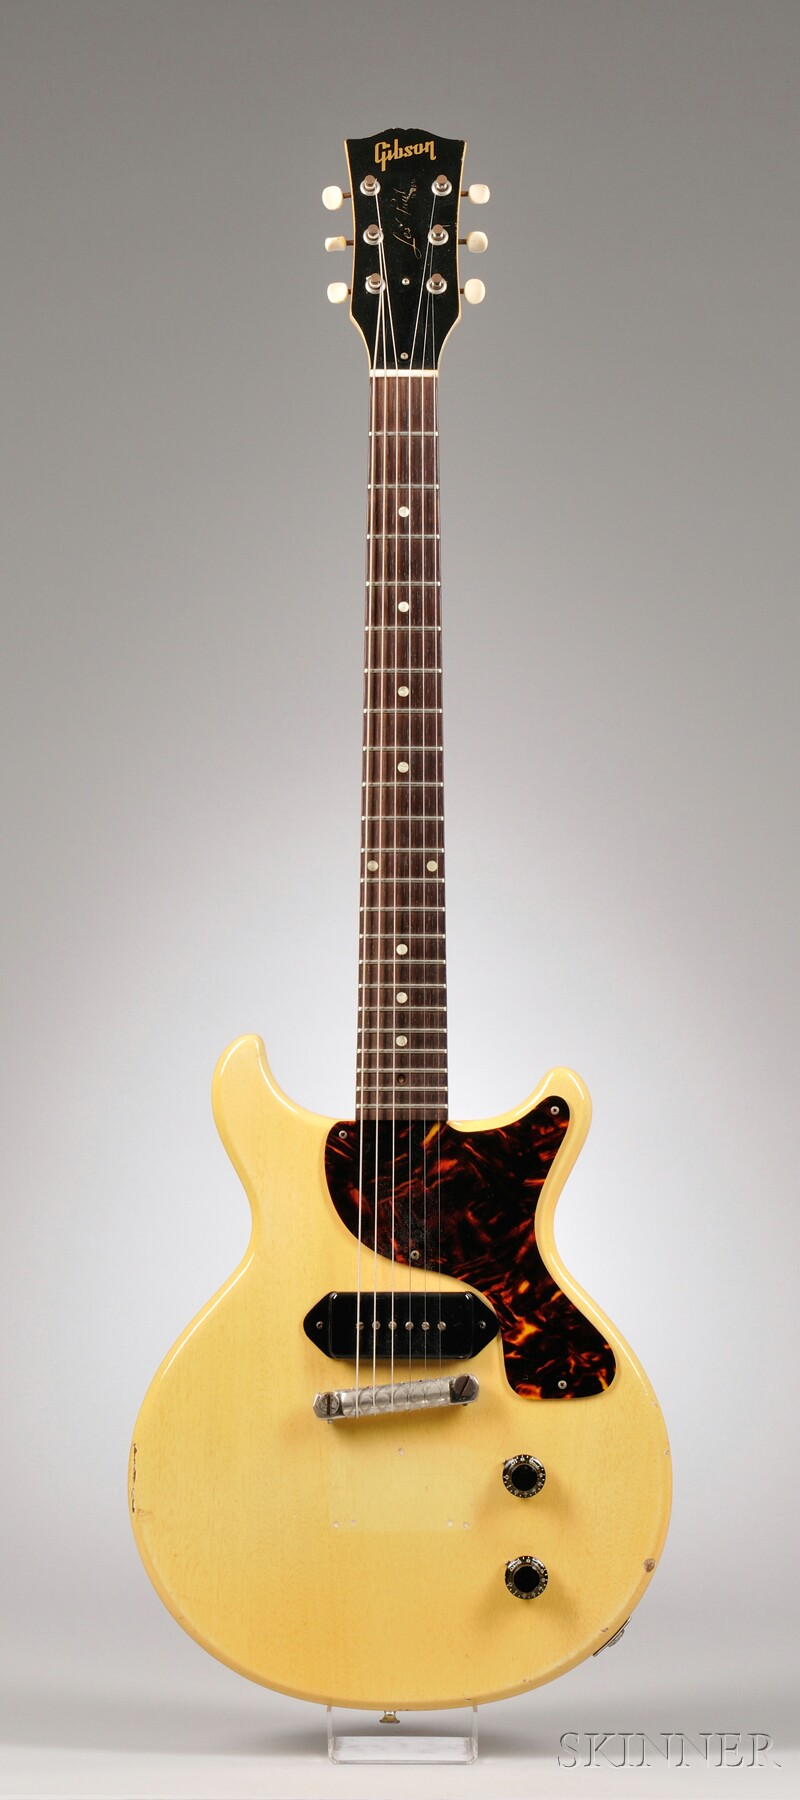 American Electric Guitar, Gibson Incorporated, Kalamazoo, 1959,  Les Paul TV Model